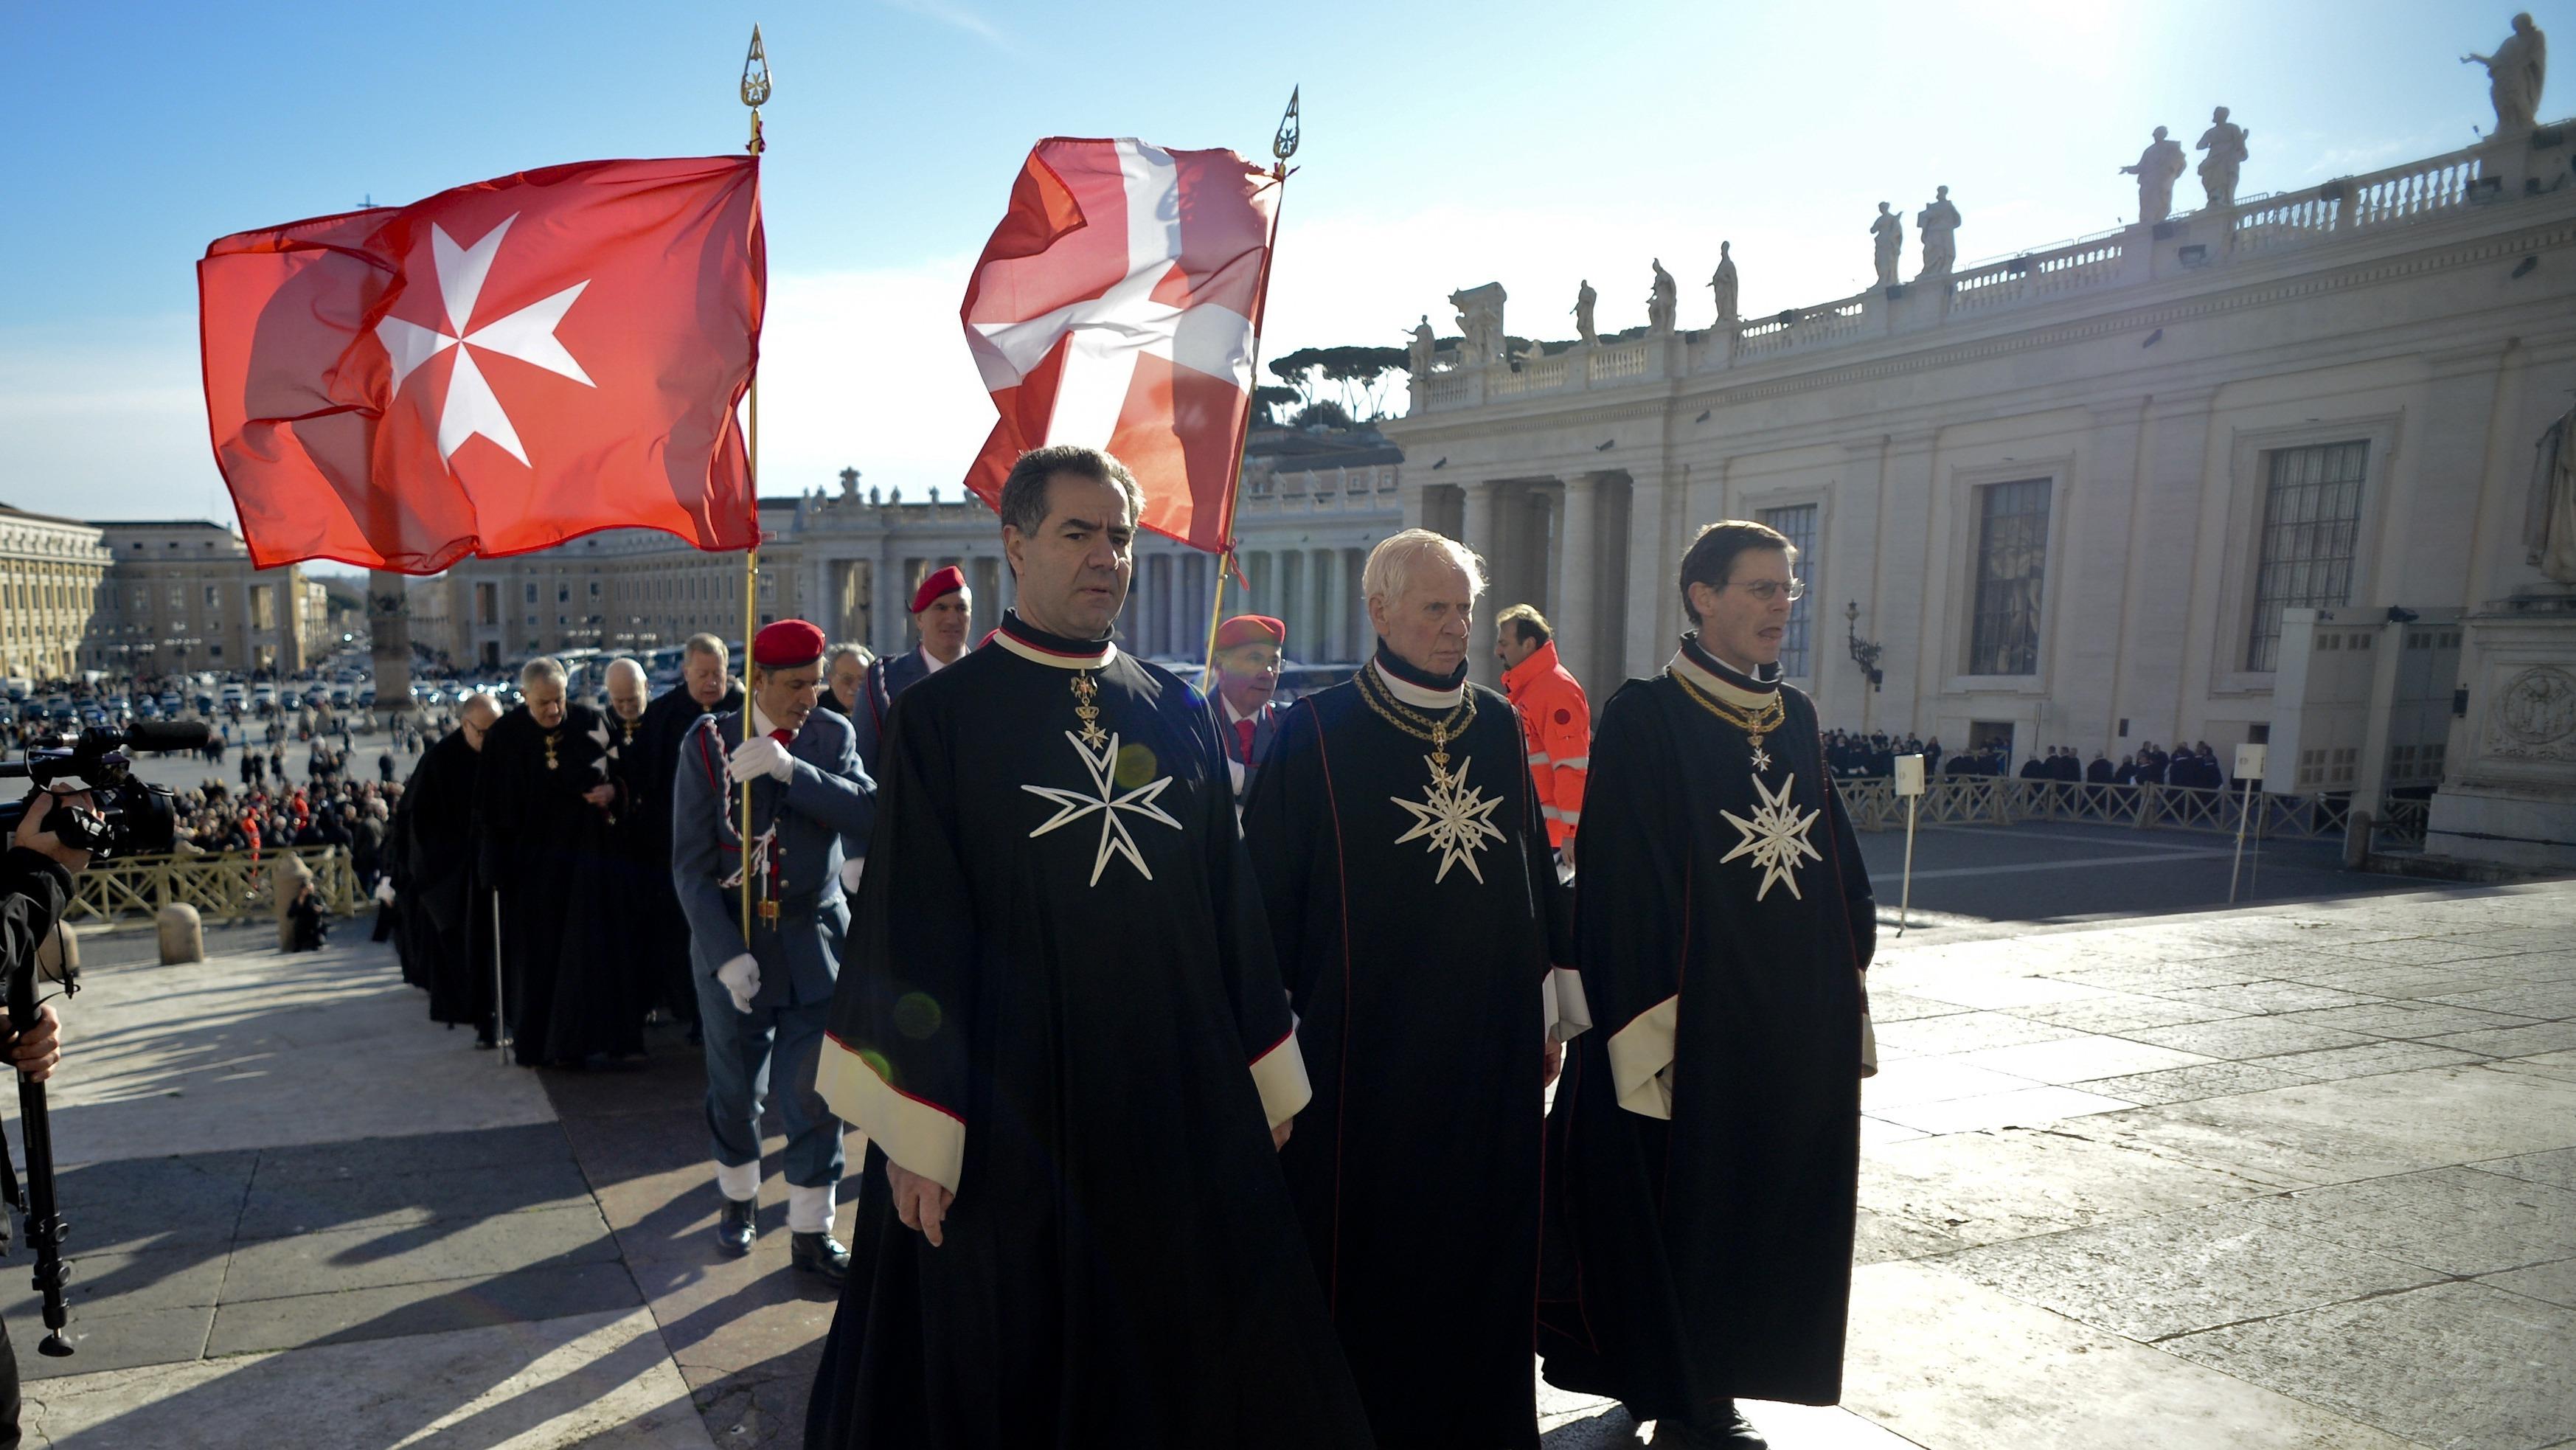 knights of malta celebrates 900th anniversary at vatican wbur news. Black Bedroom Furniture Sets. Home Design Ideas